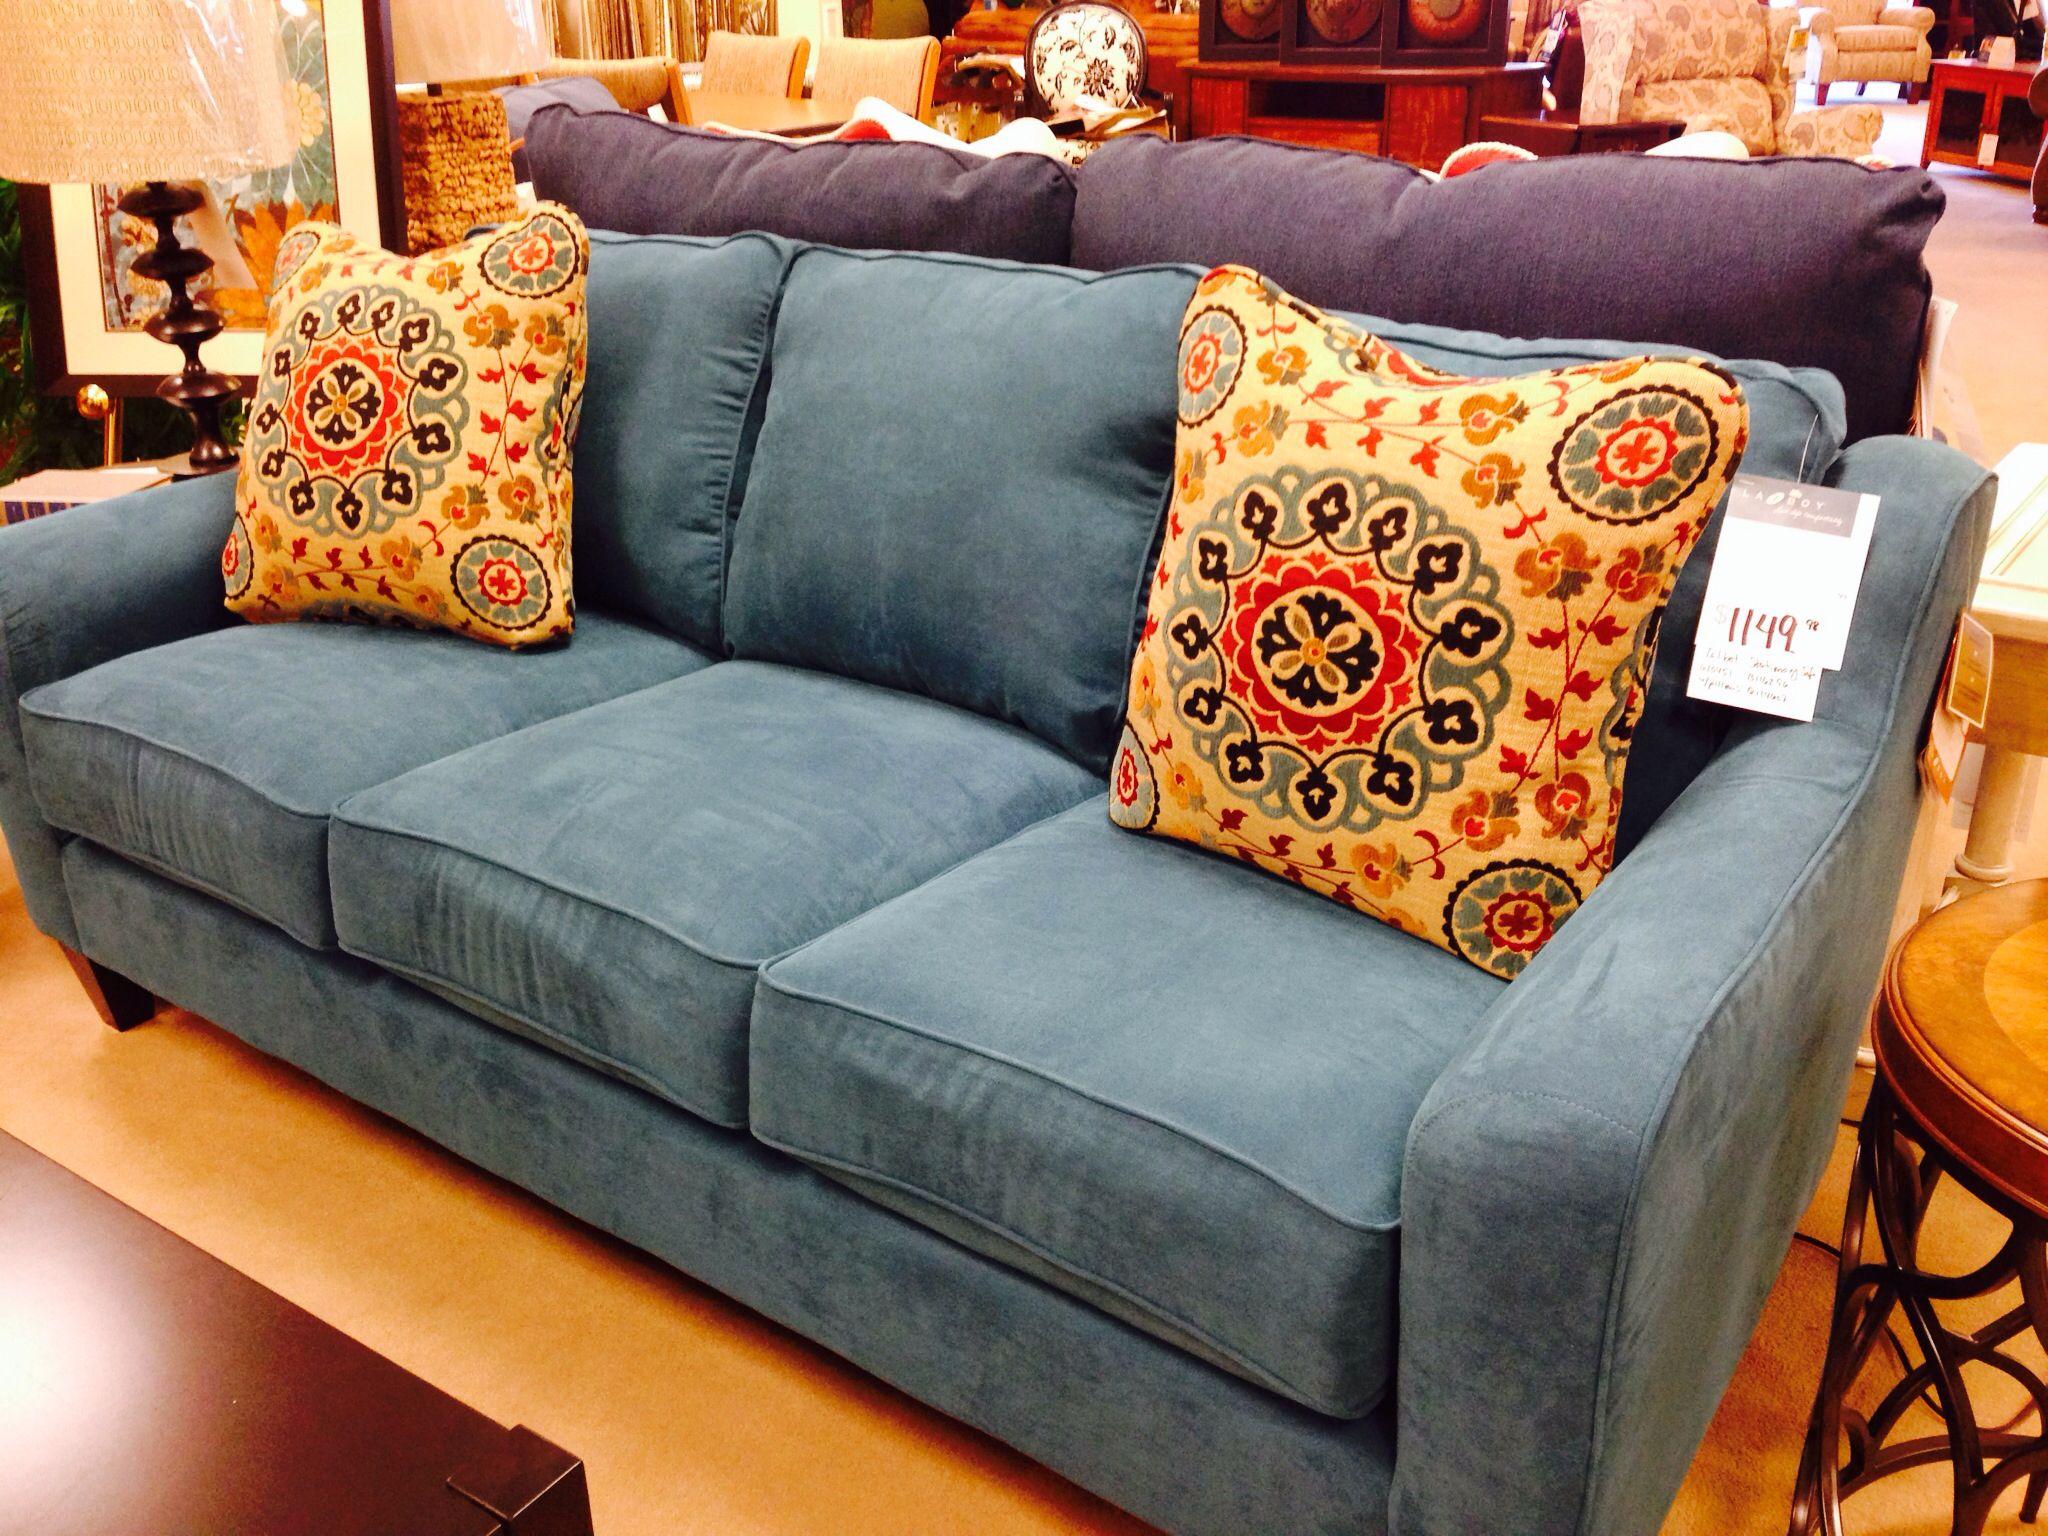 Sofa at lazy boy Home decor, Furniture, Decor